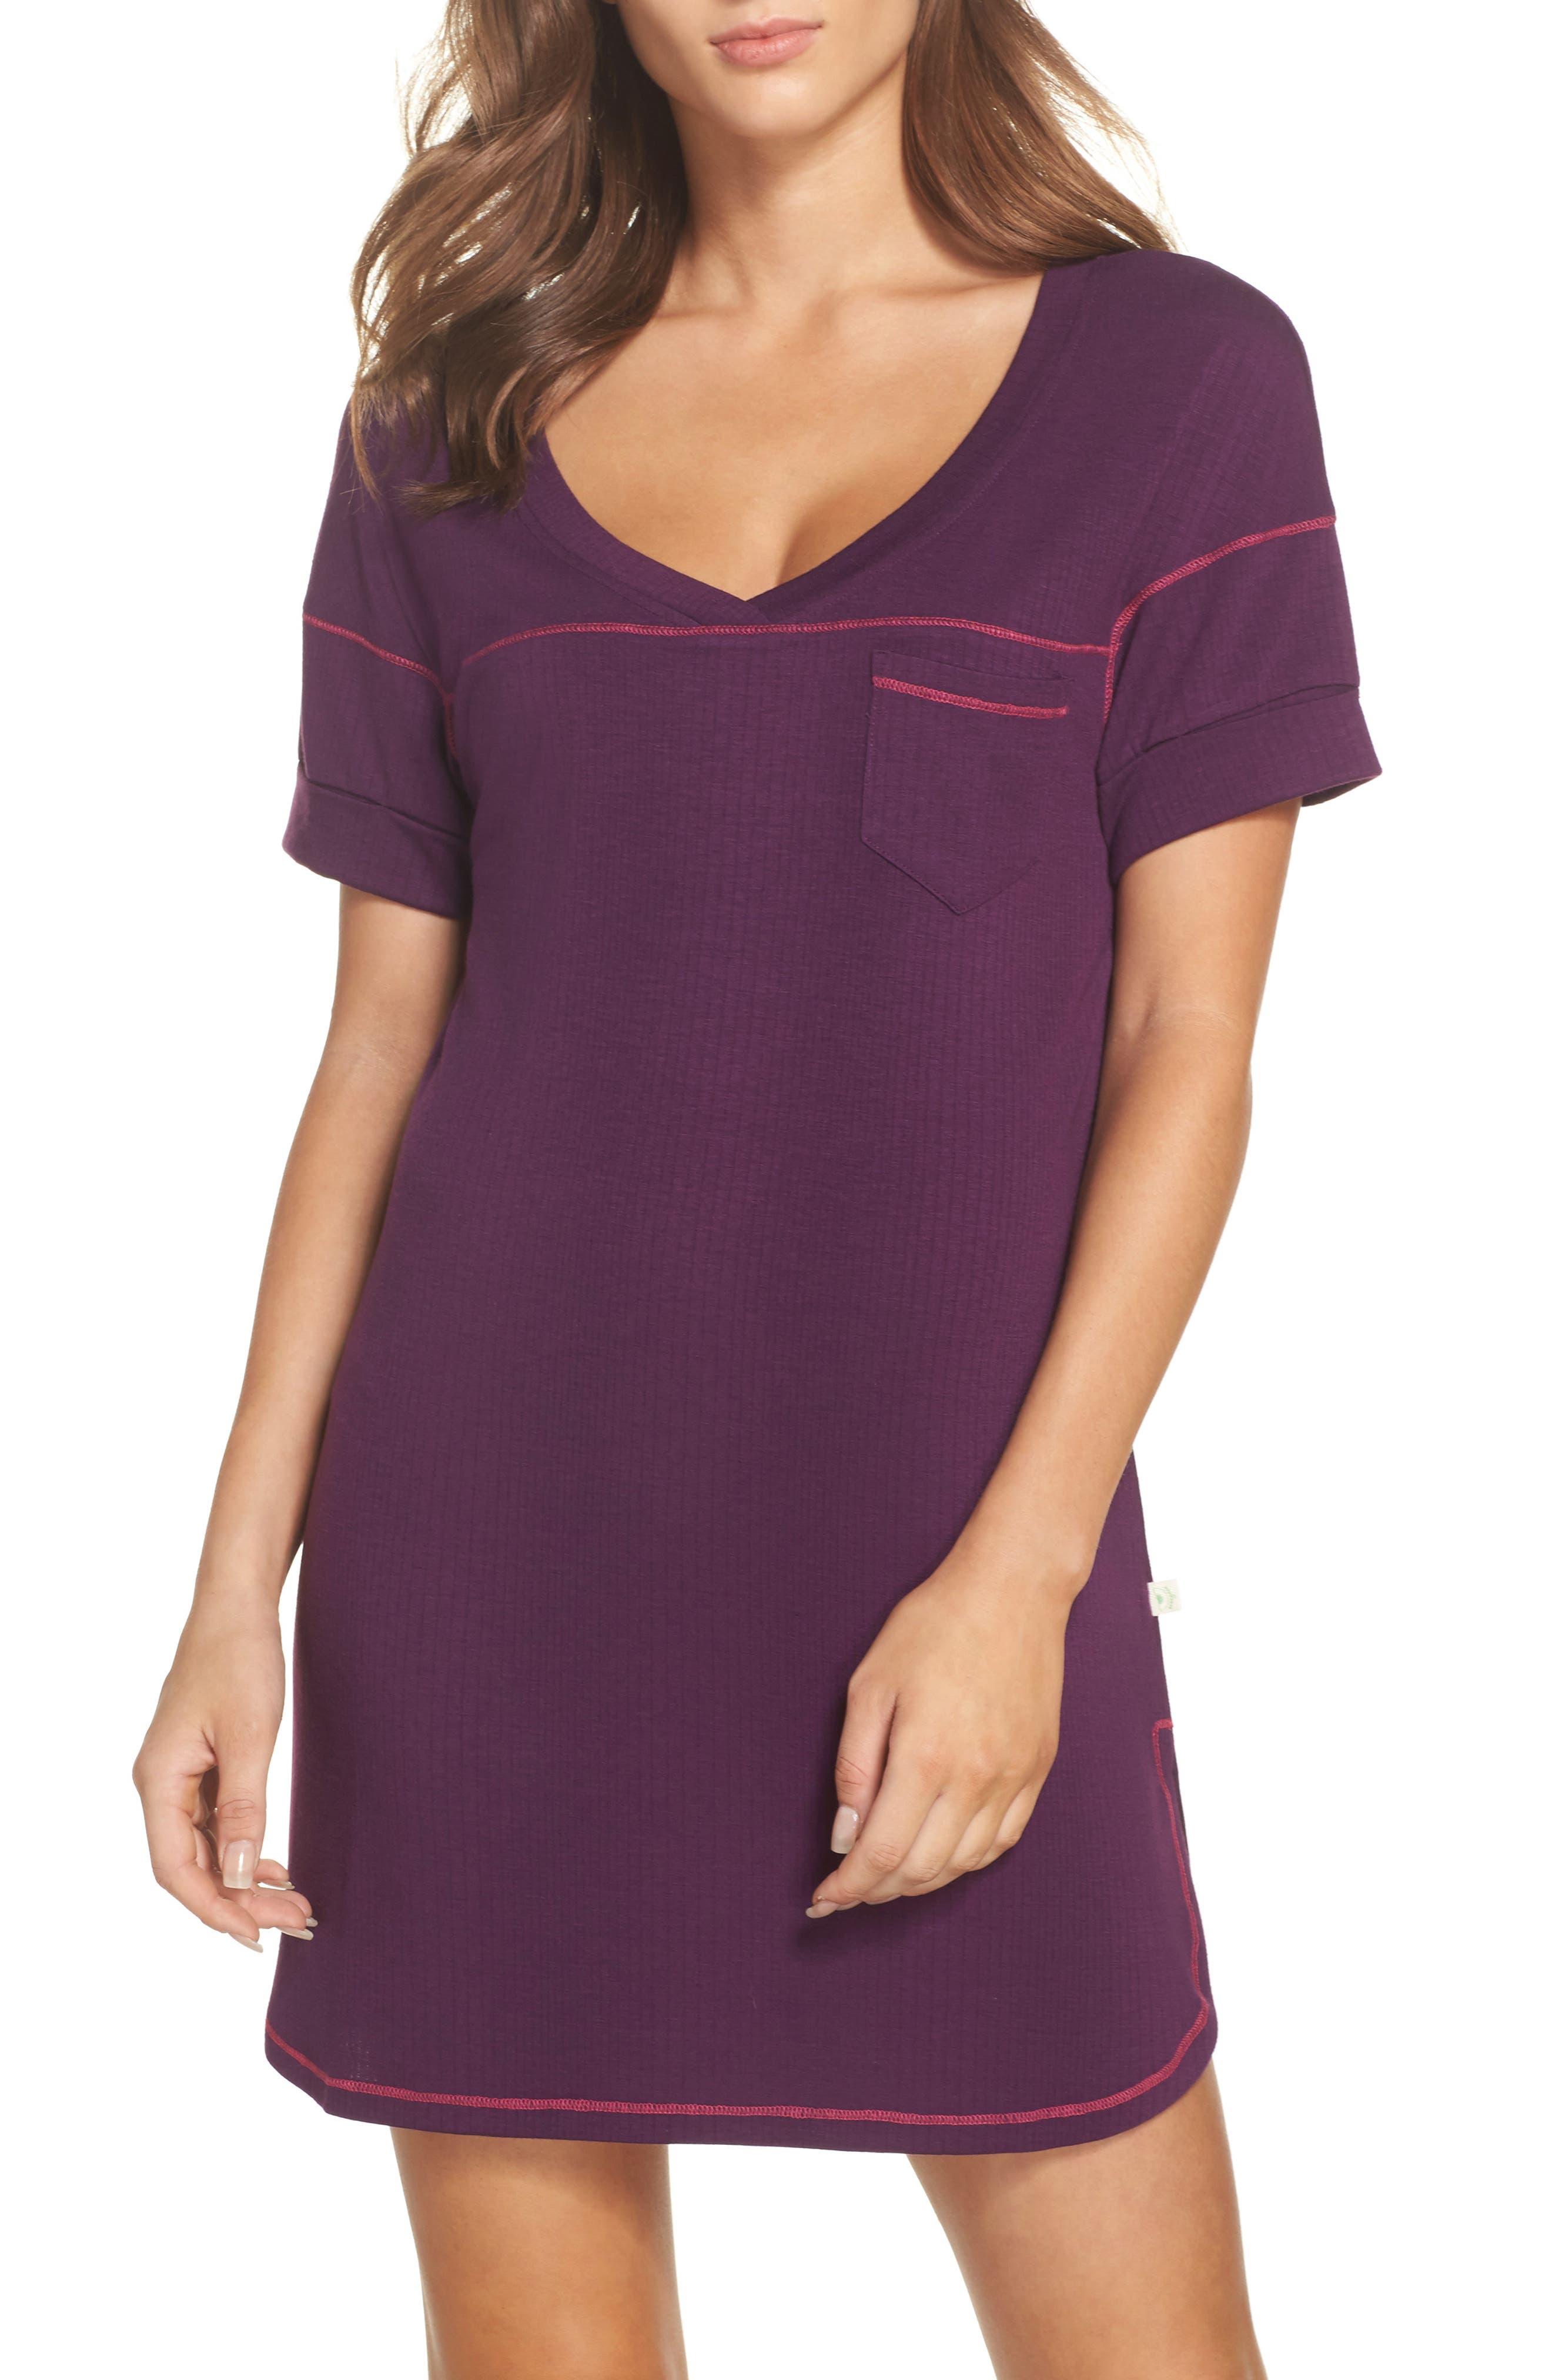 Honeydew Intimates Rib Sleep Shirt (2 for $60)